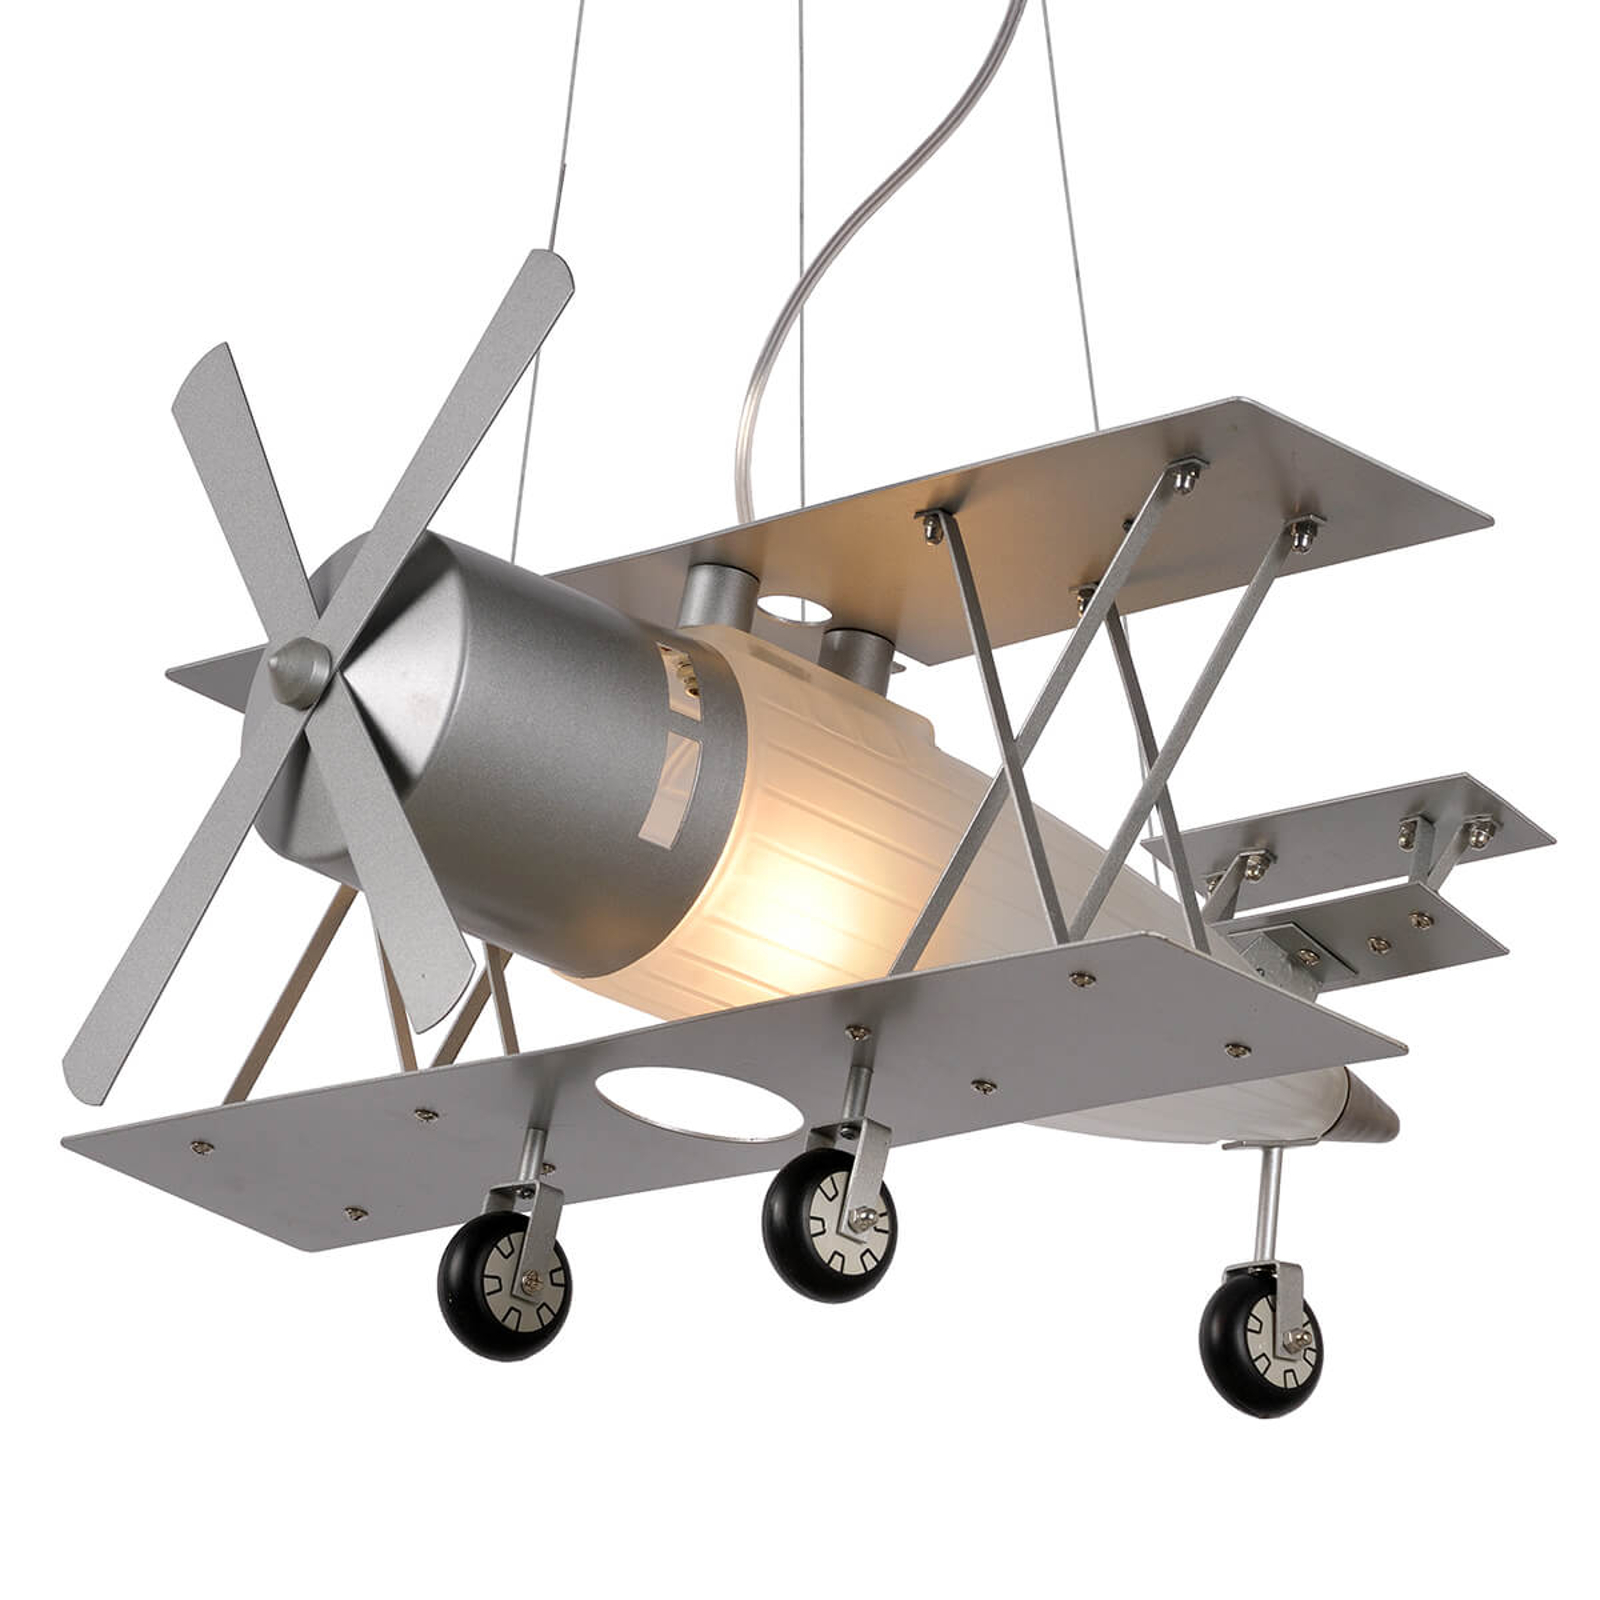 Focker - pendellampe med form som en flyvemaskine